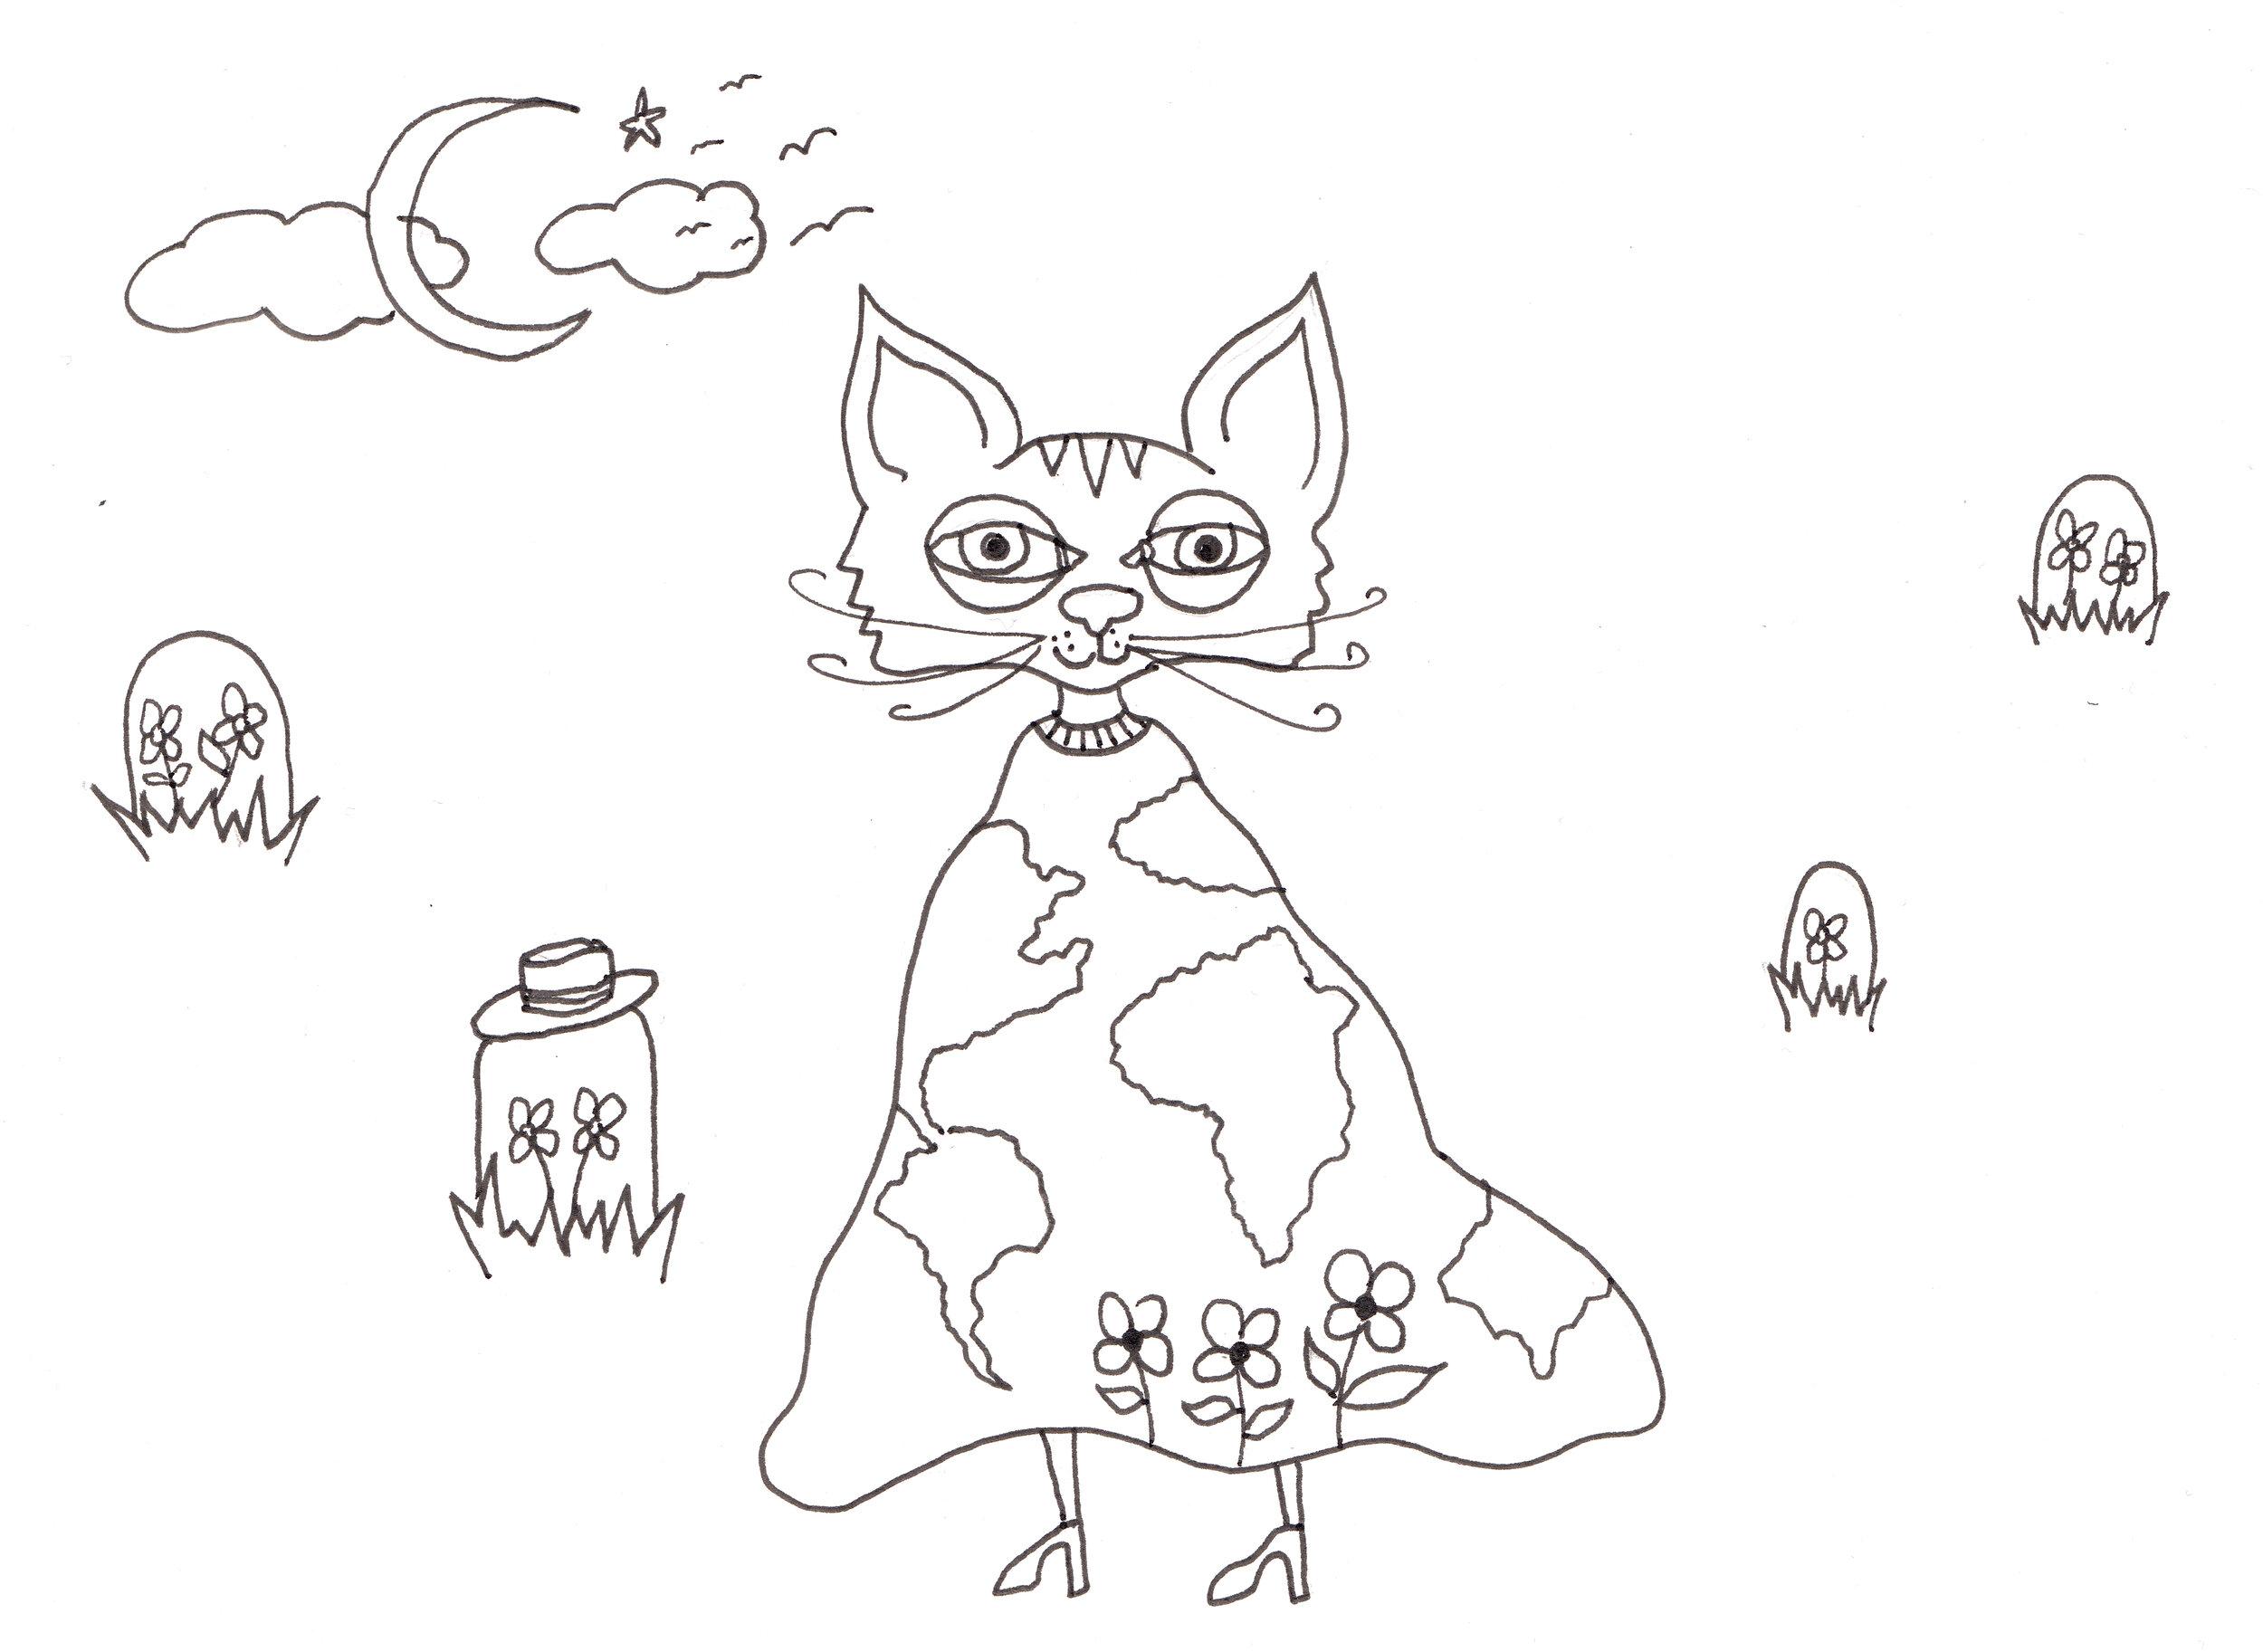 Earth blanket cat cowgirl crop .jpg